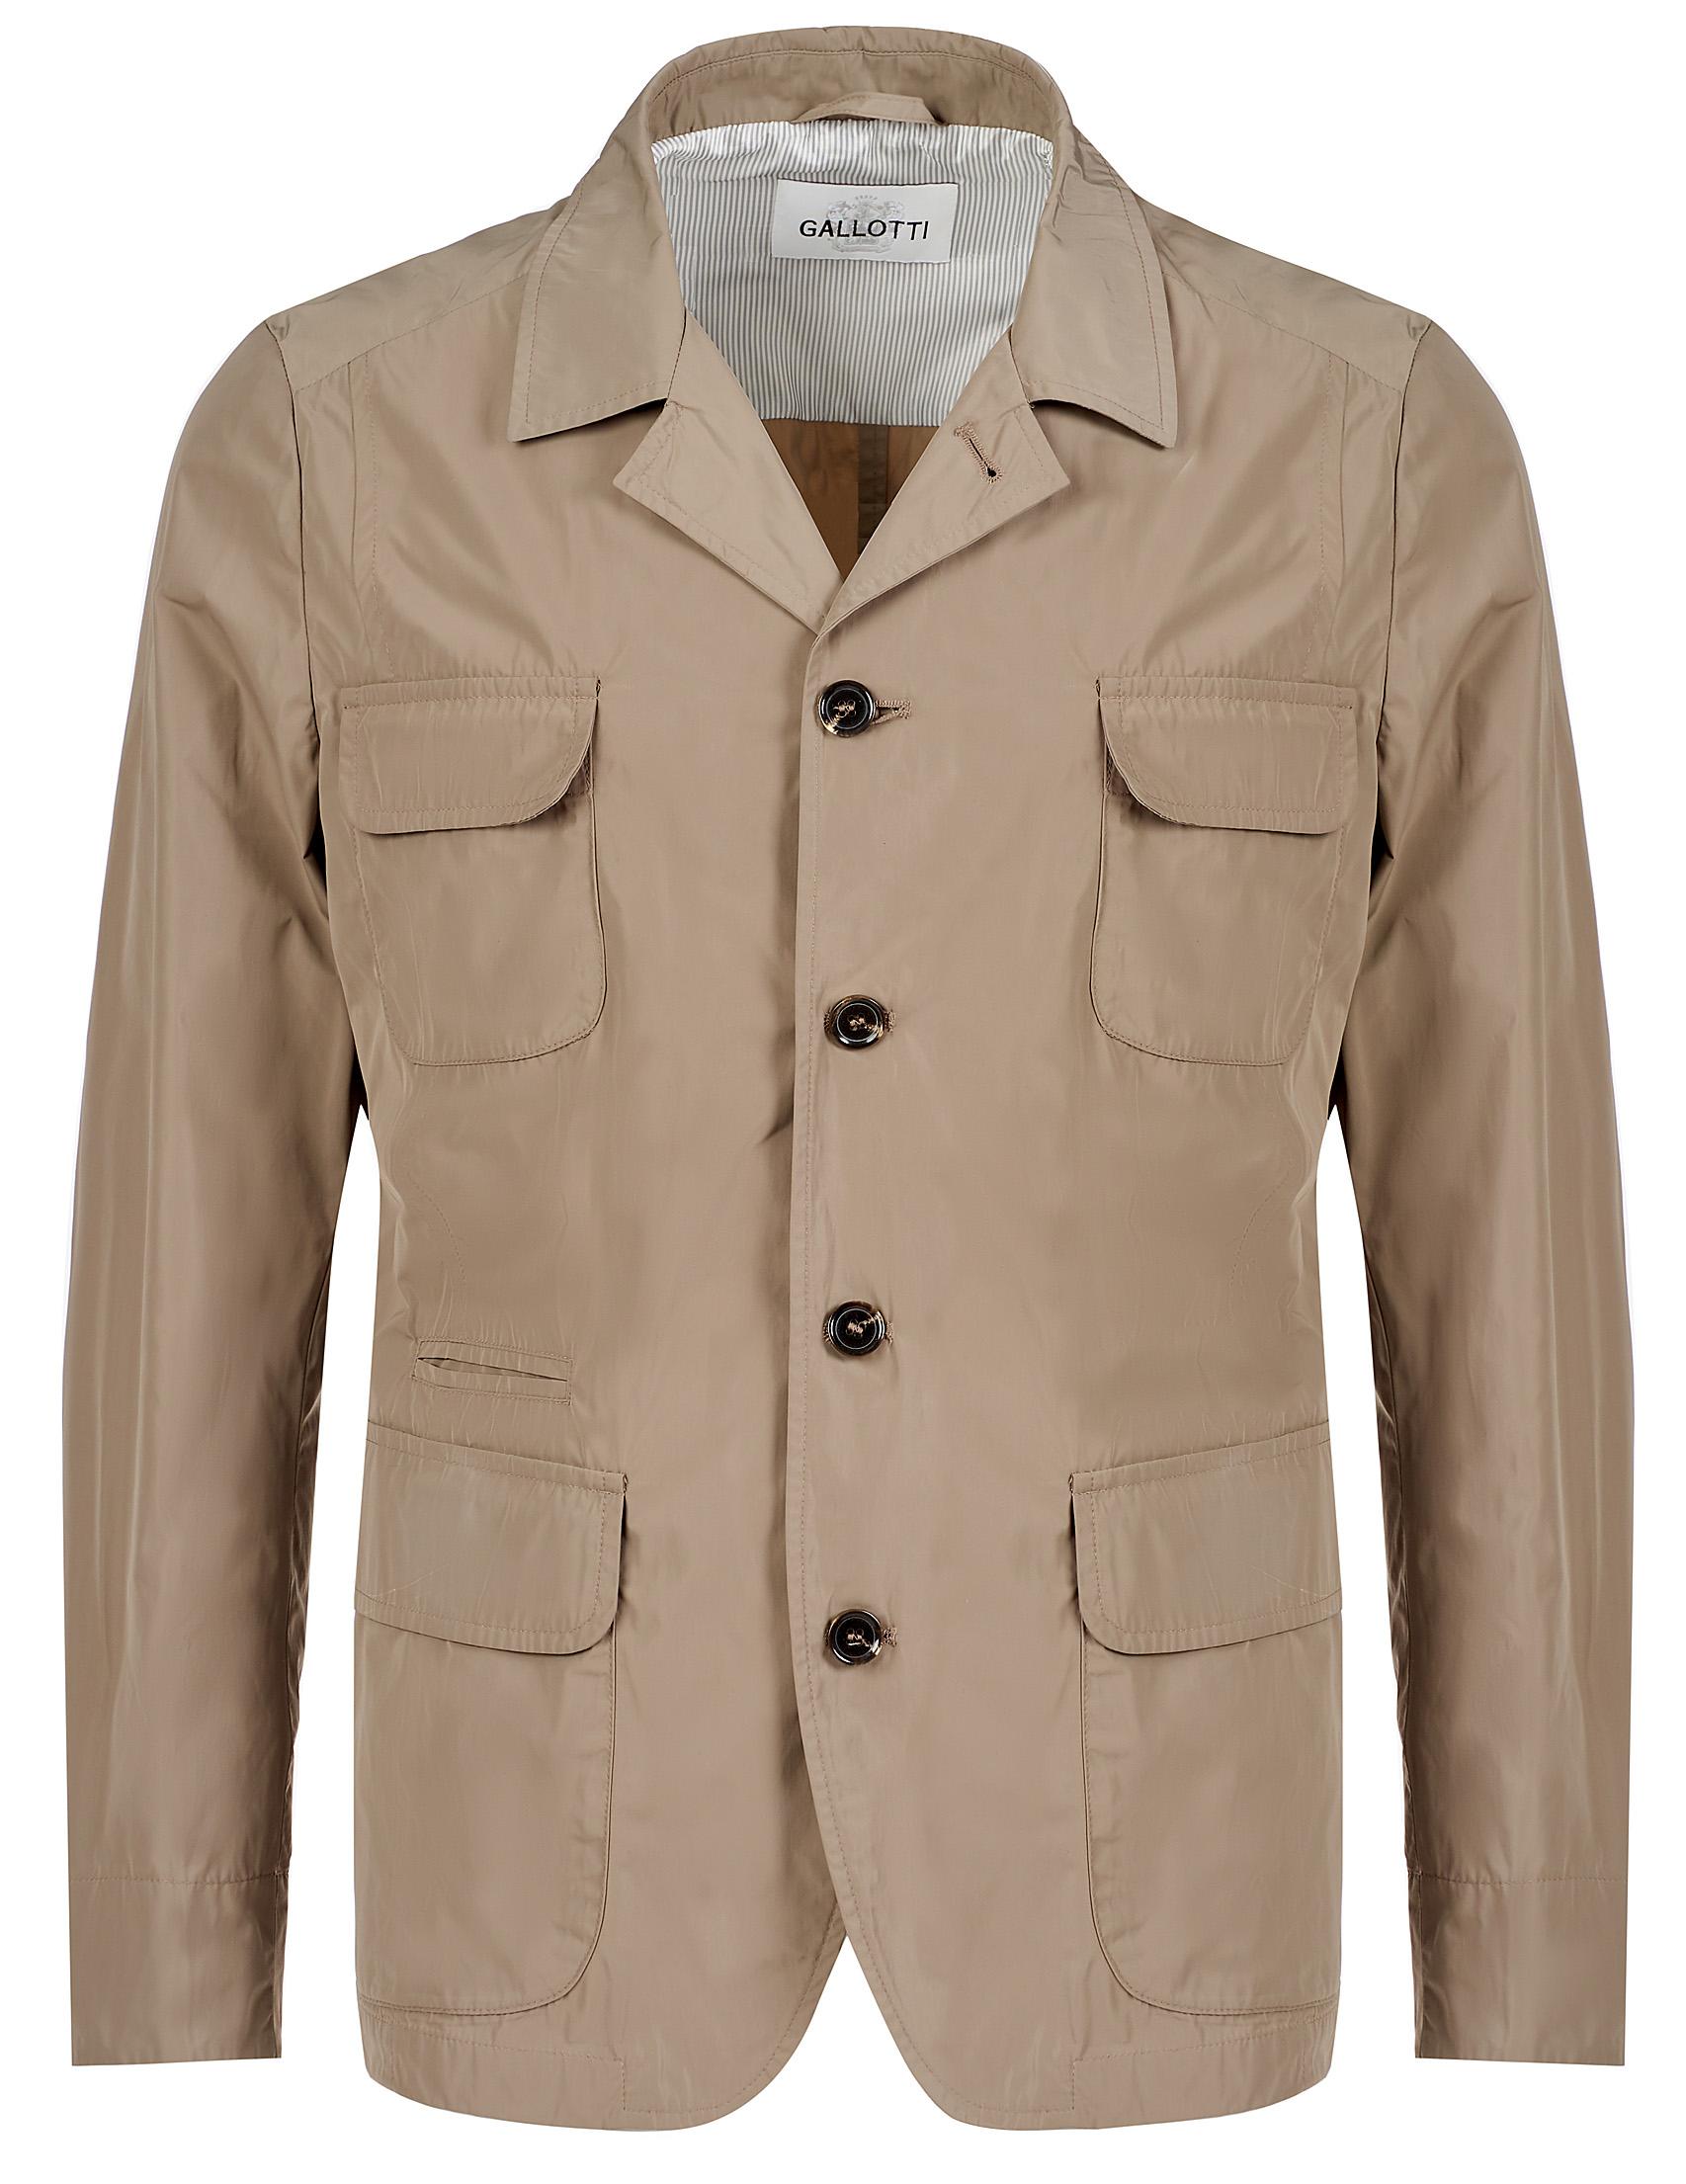 Купить Куртки, Куртка, GALLOTTI, Бежевый, 100%Полиэстер, Осень-Зима